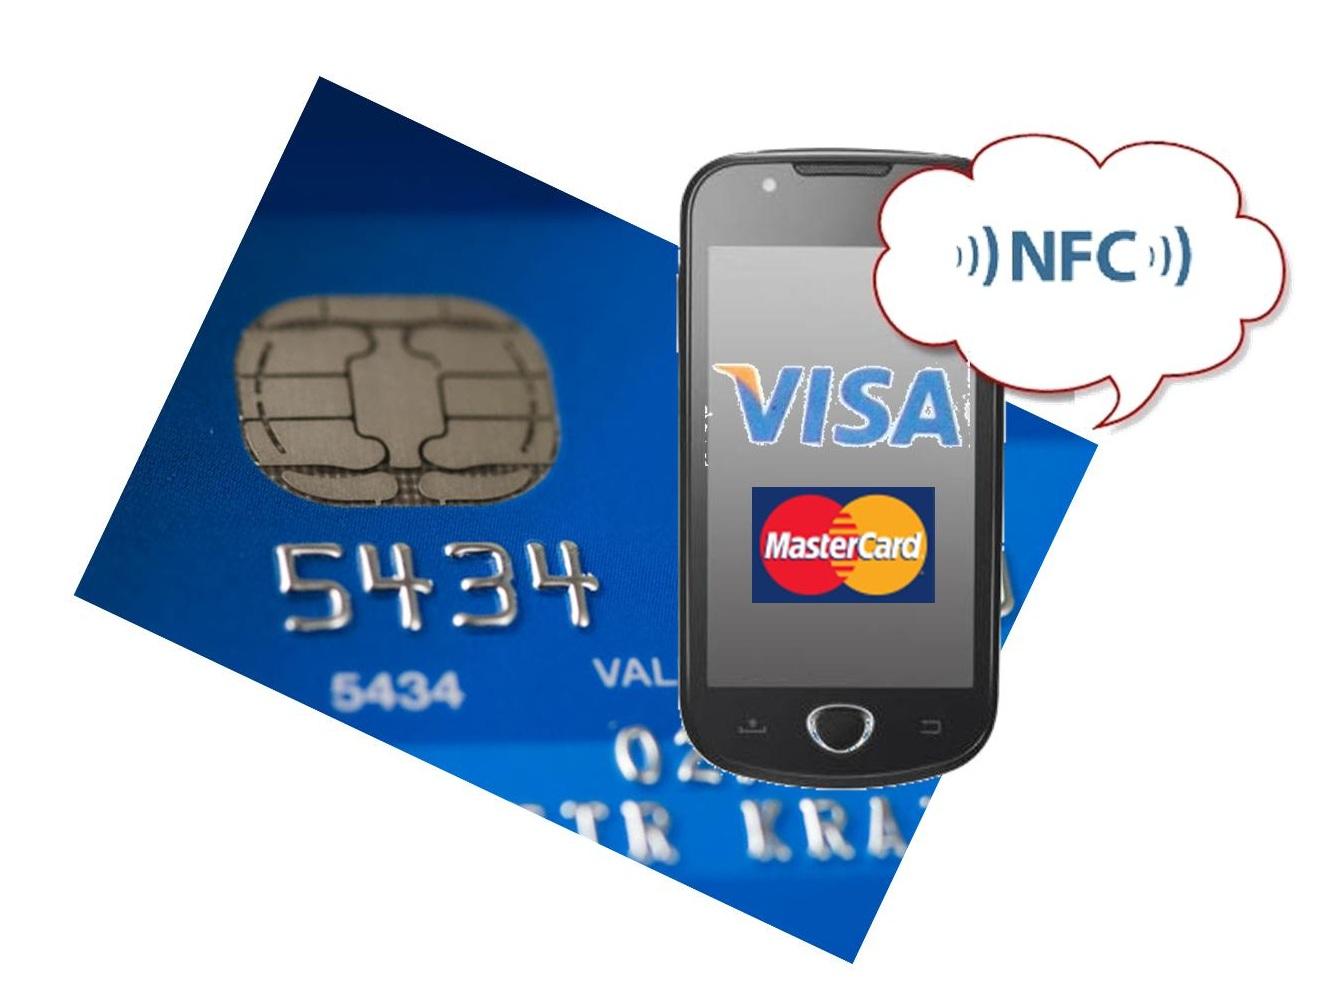 NFC Technology Major Credit Cards